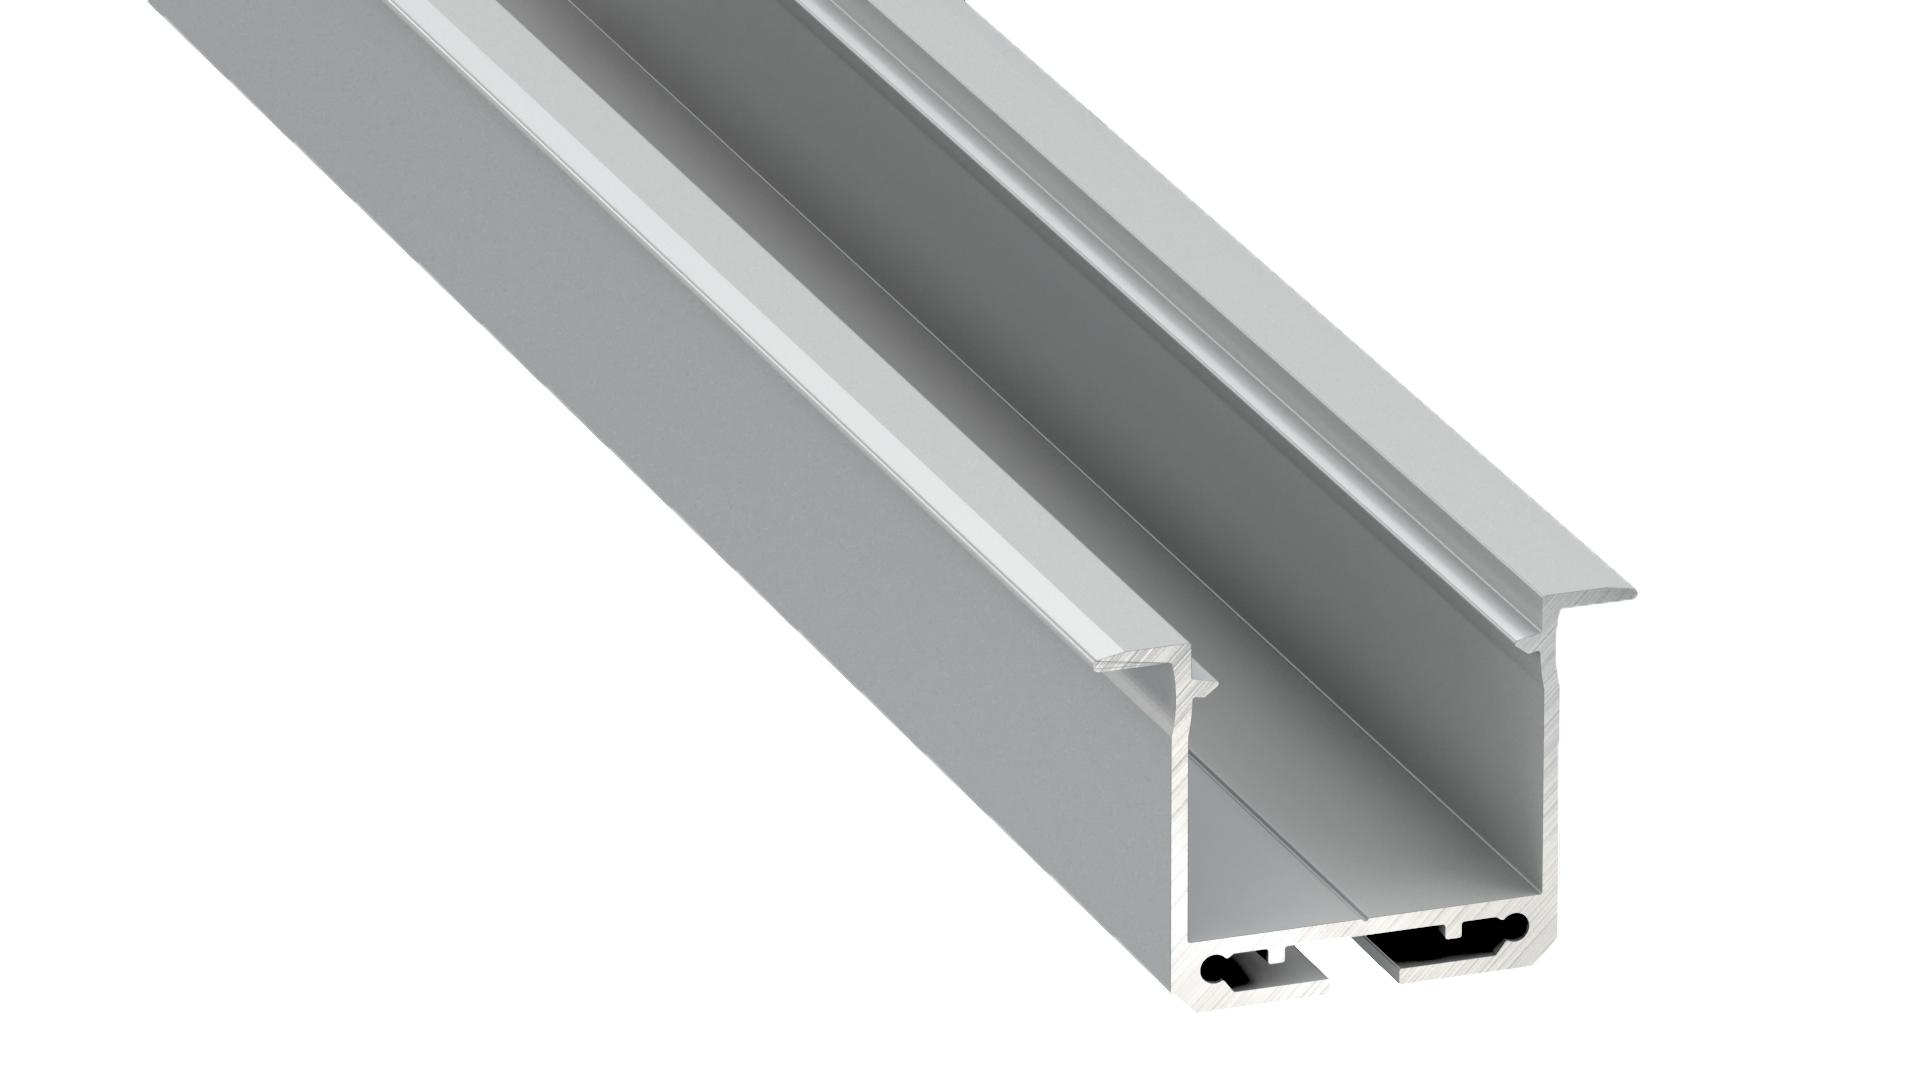 Aluminiumprofil, Silber Typ K, 2 m + Opaldiffusor, Befestigungsfeder